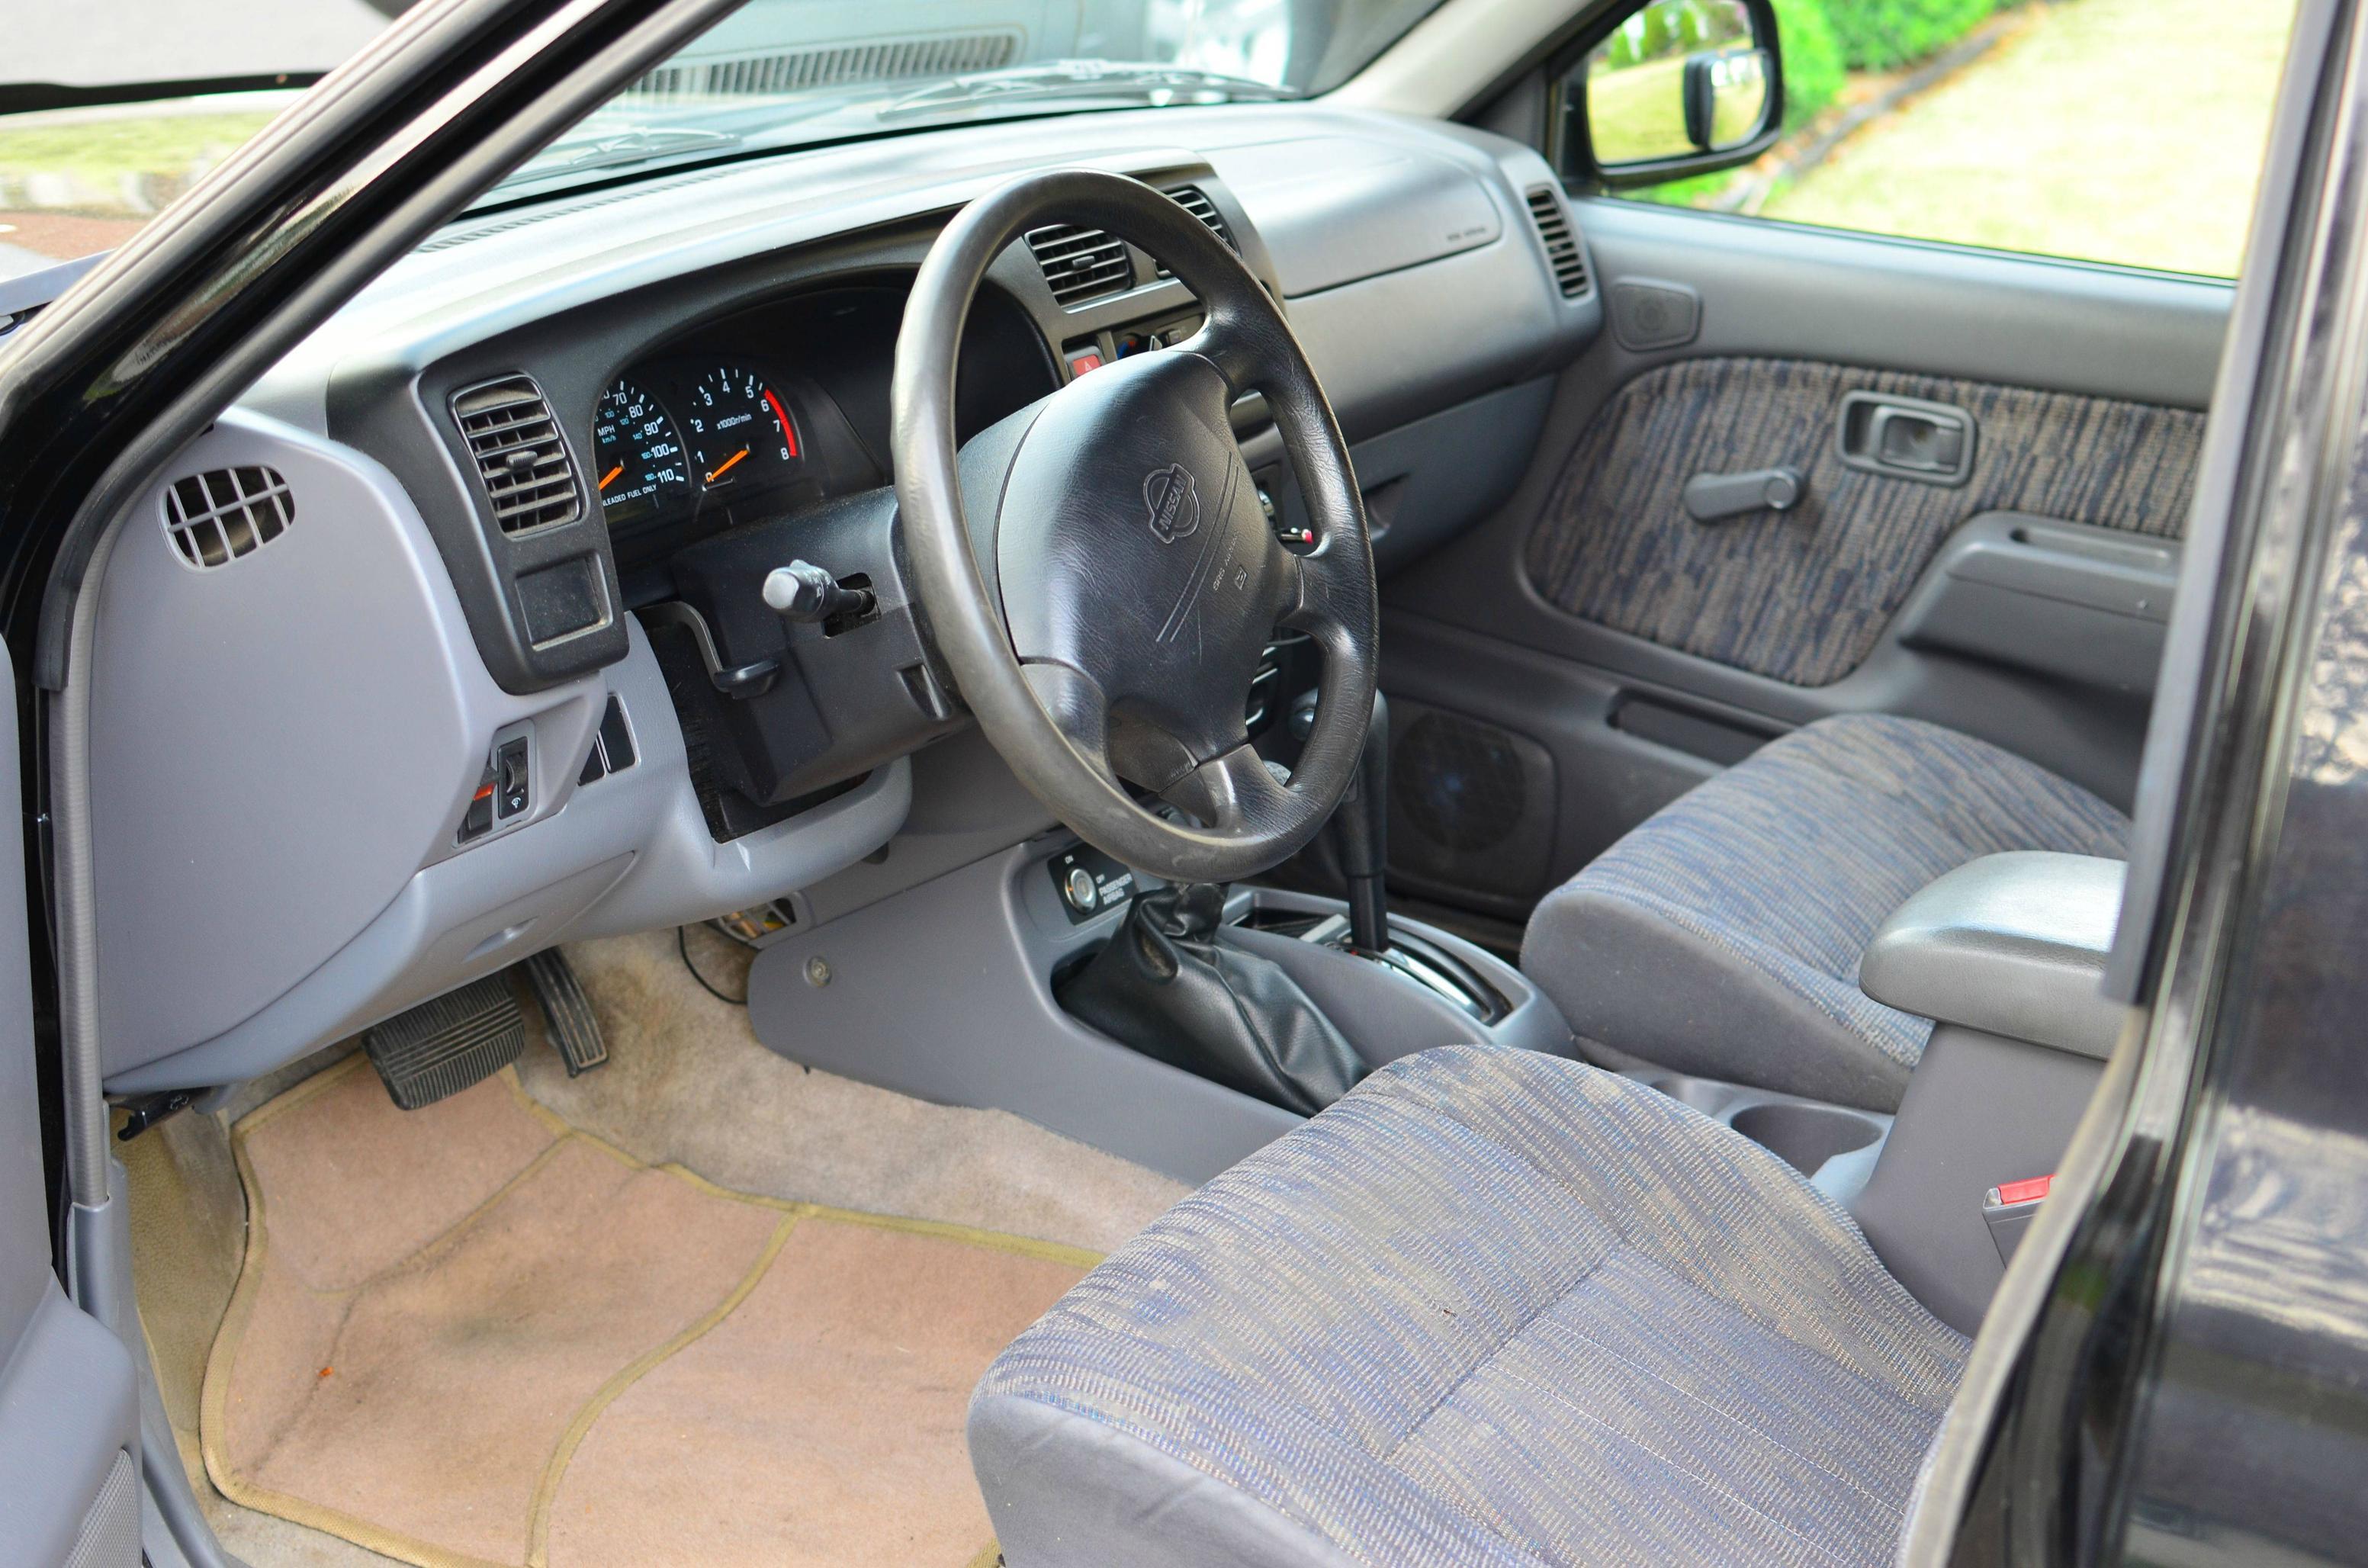 1999 Nissan Frontier Image 17